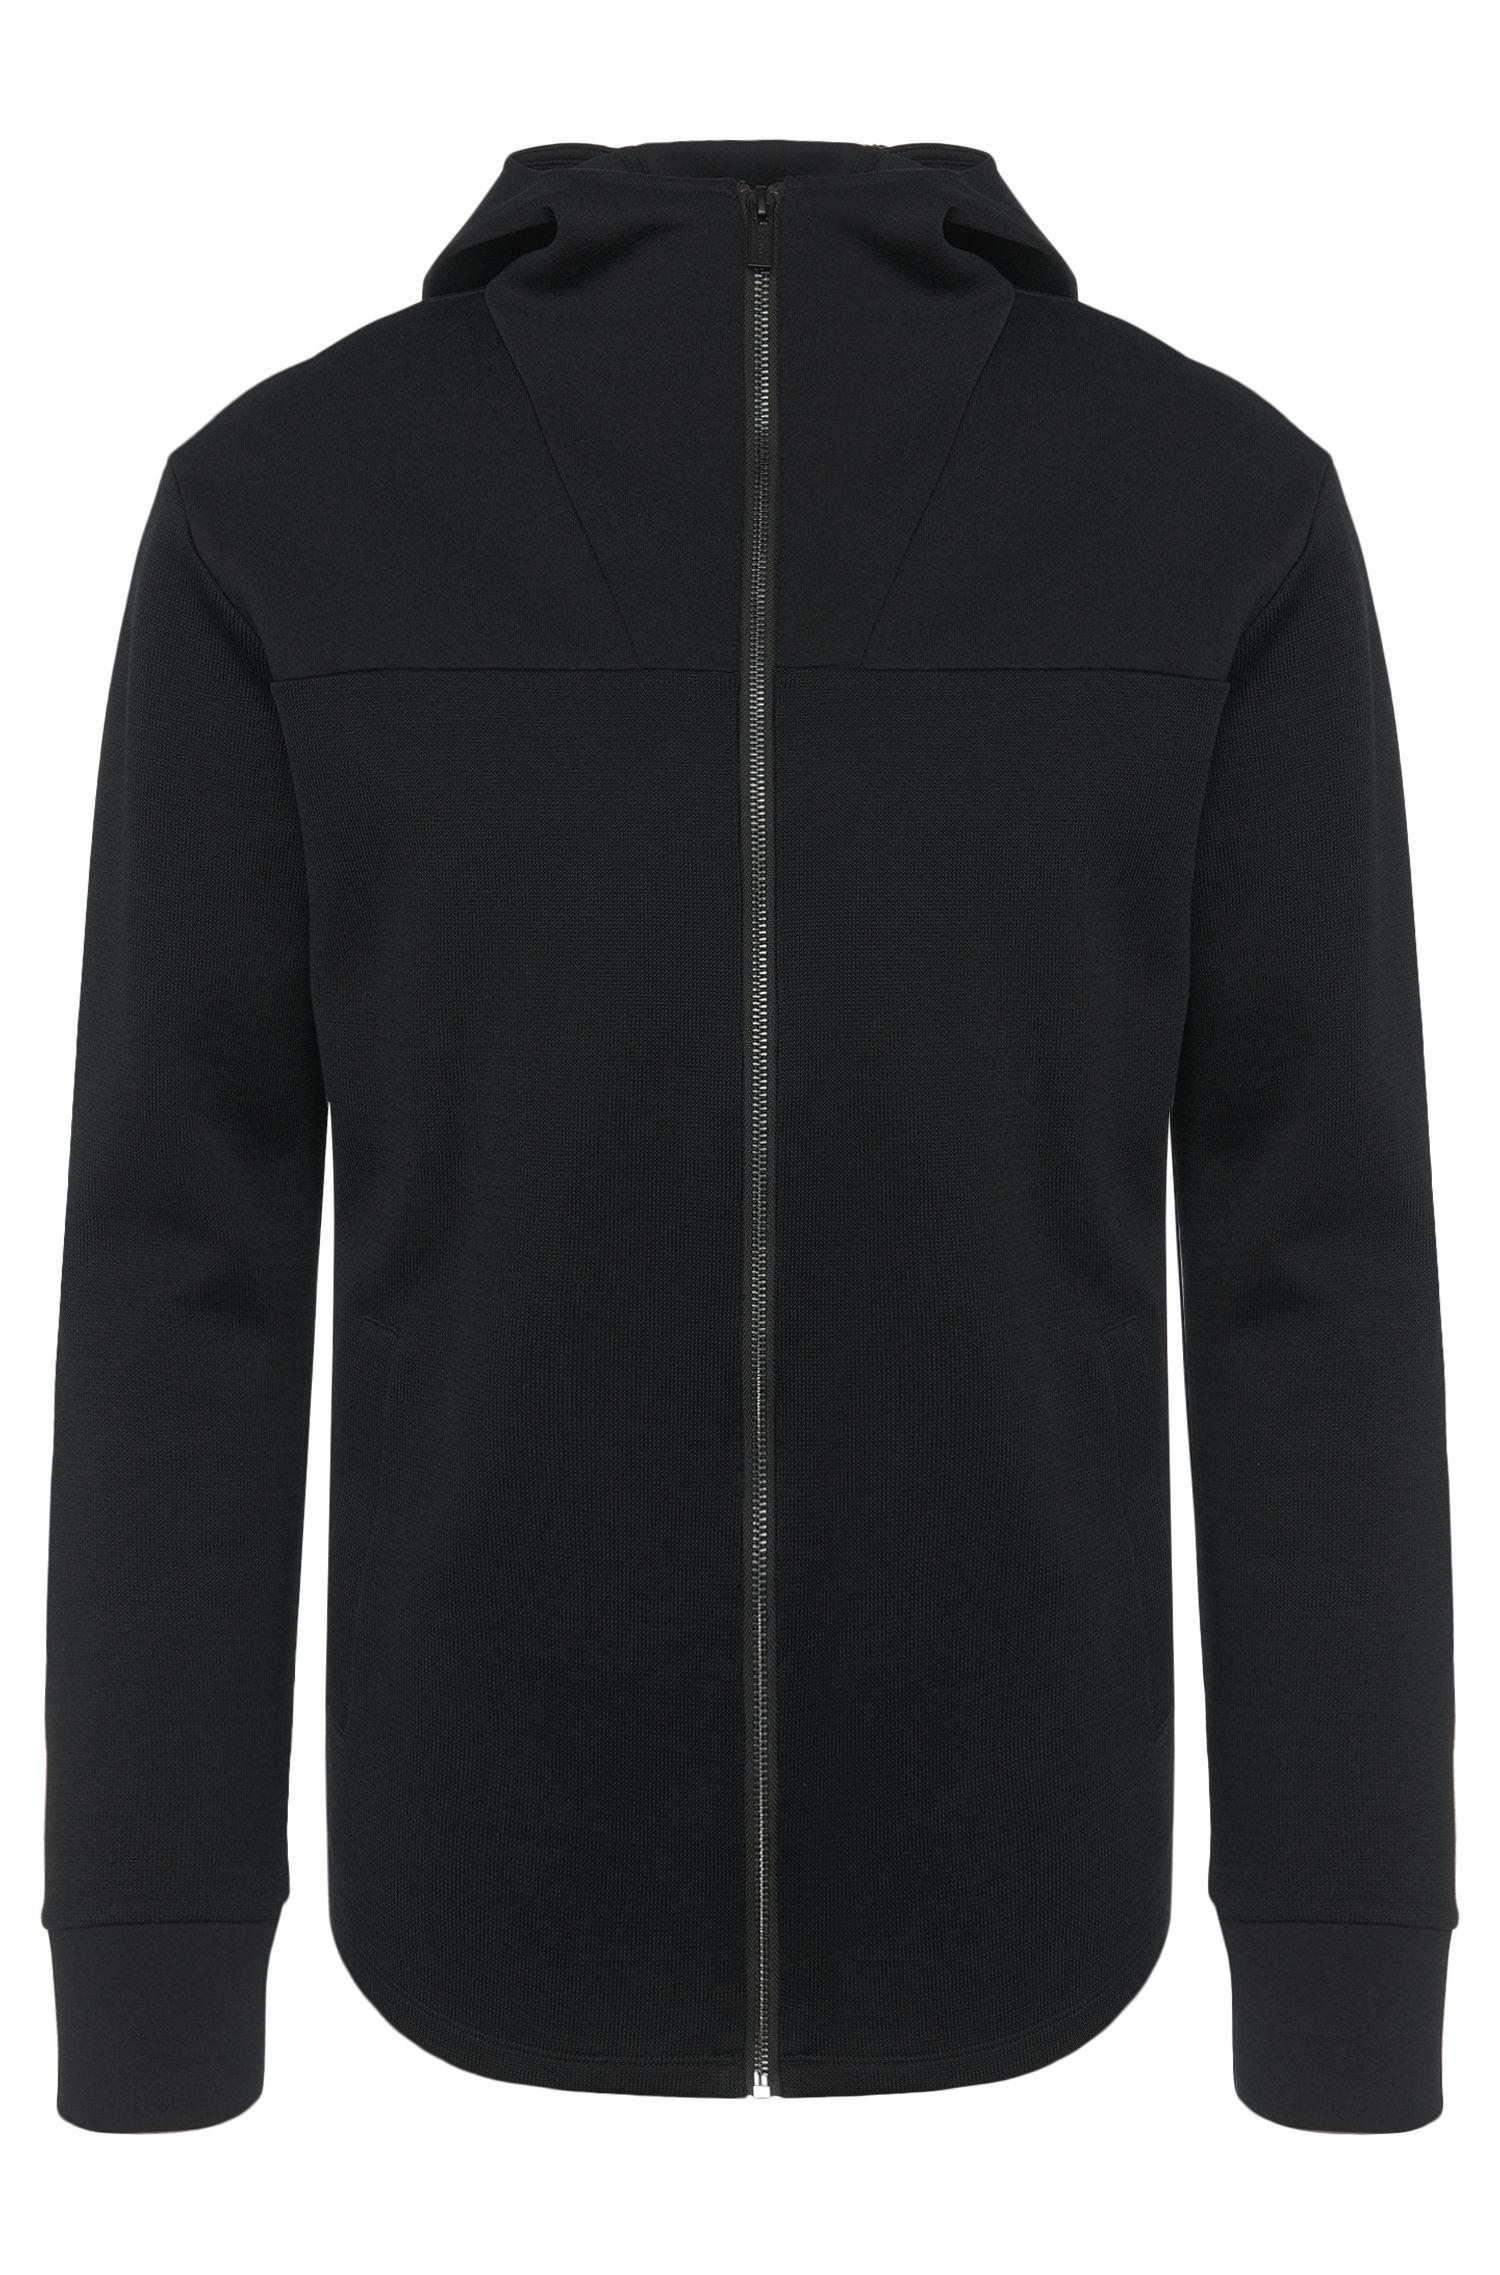 Loose-Fit Sweatshirtjacke aus Baumwolle mit Kapuze: 'Dabrusco'